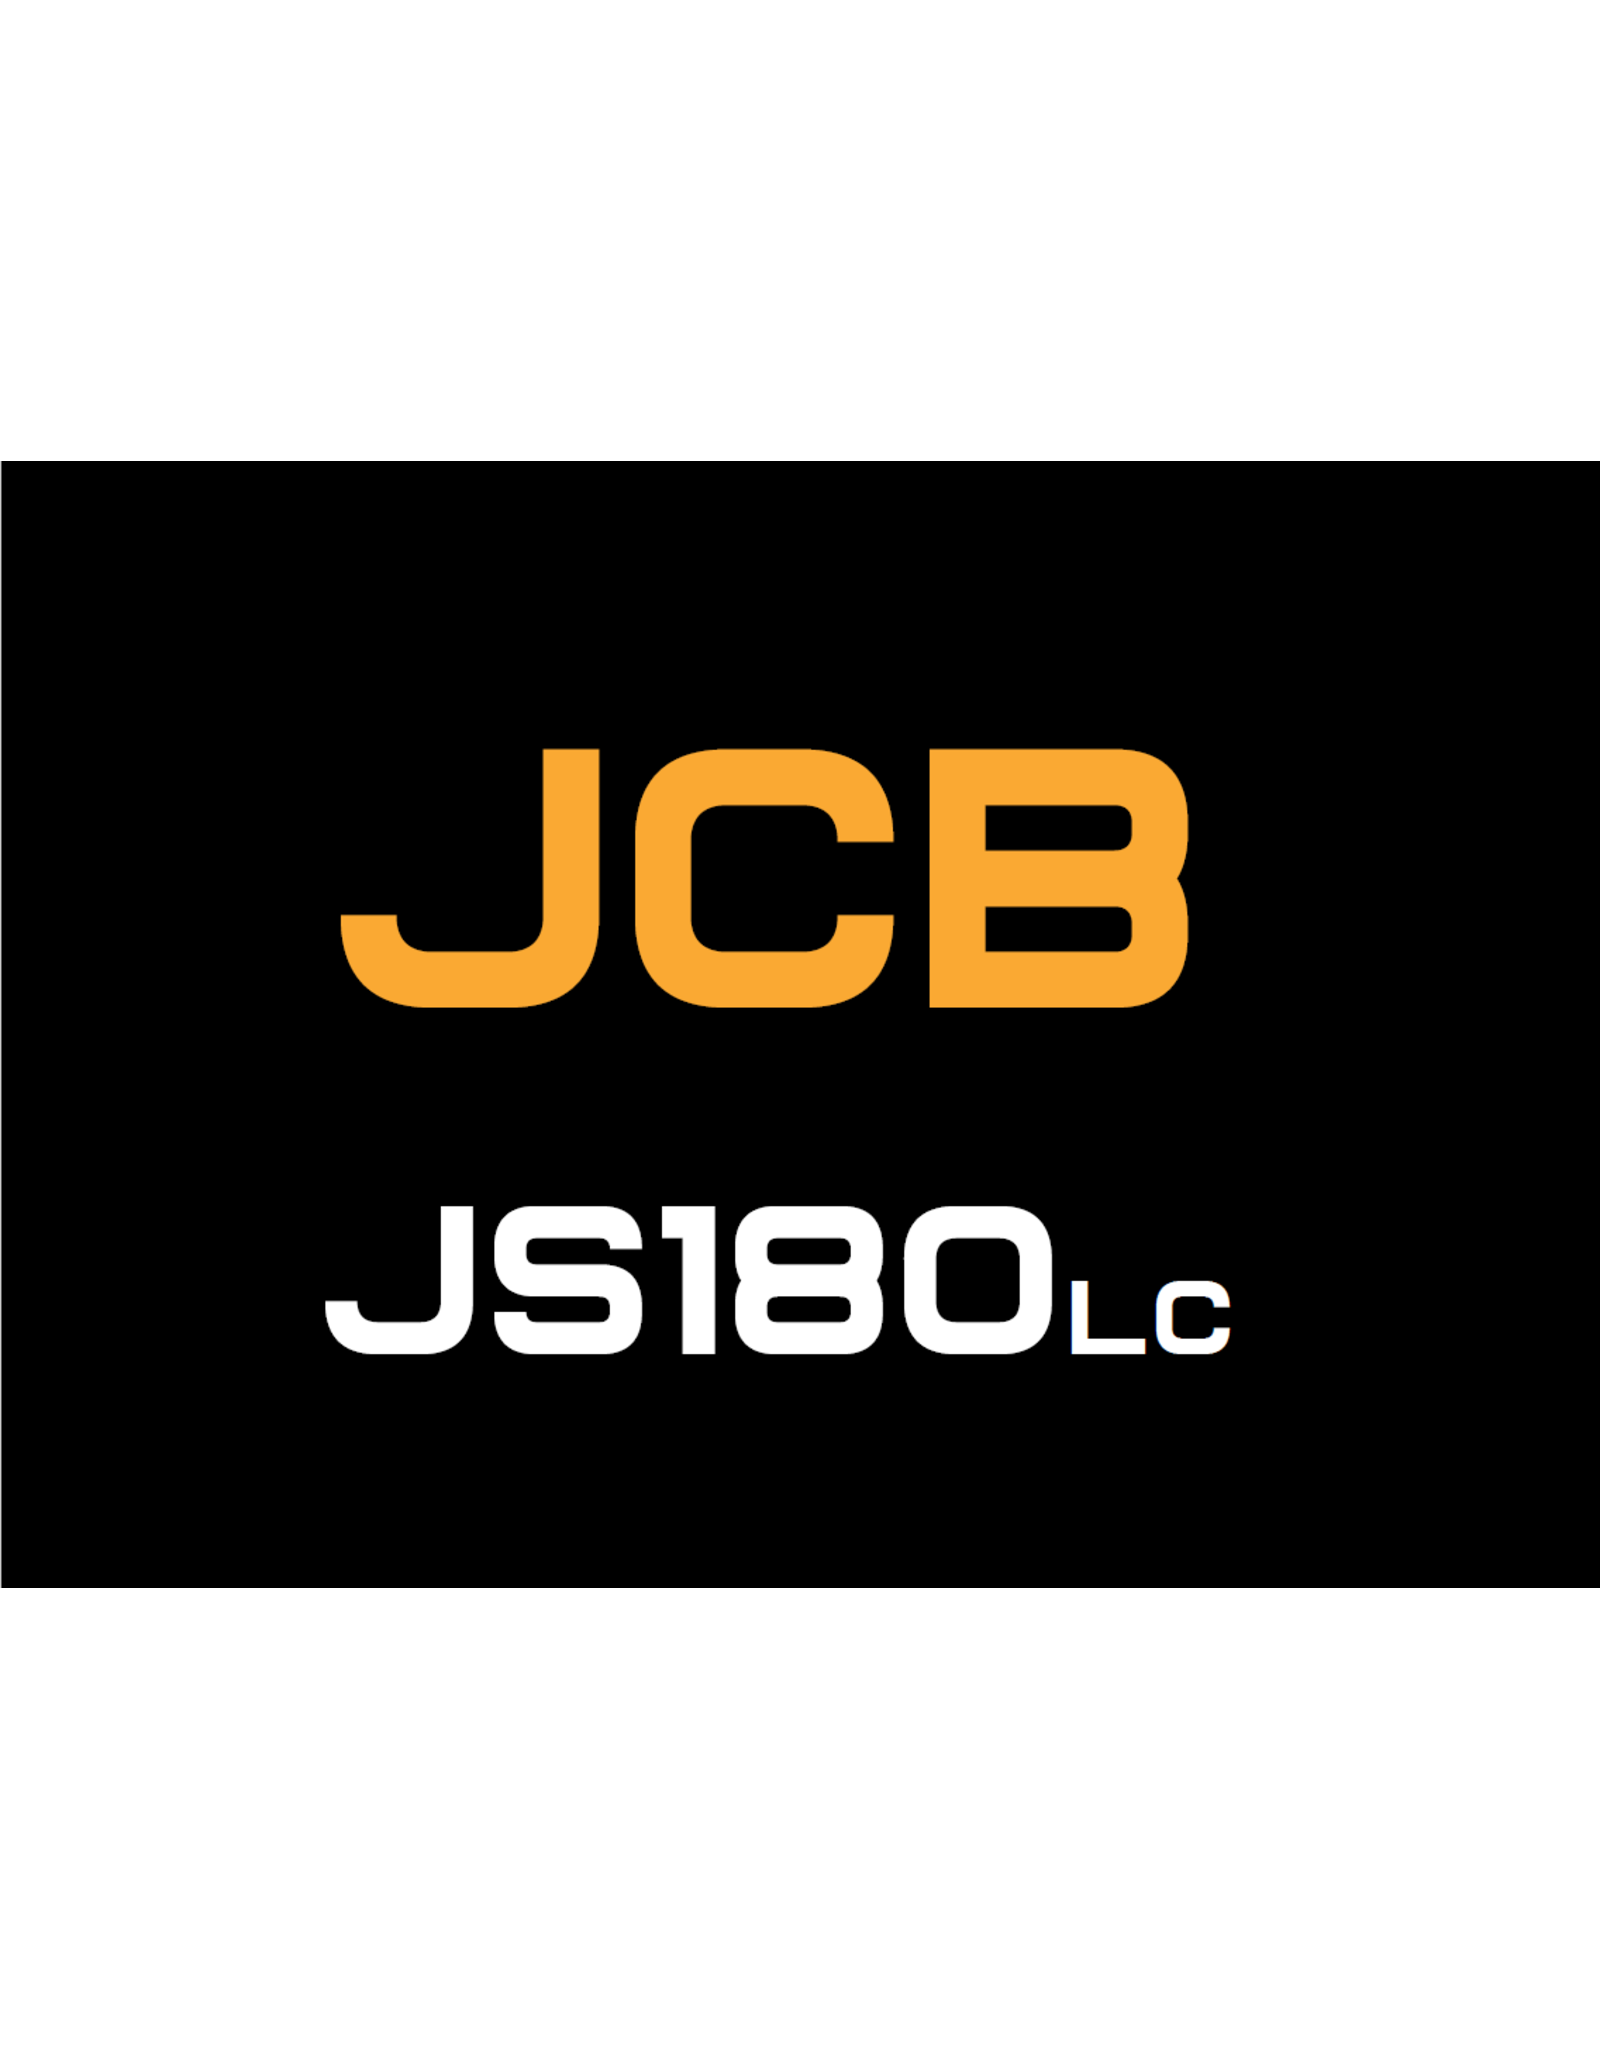 Echle Hartstahl GmbH FOPS for JCB JS180LC